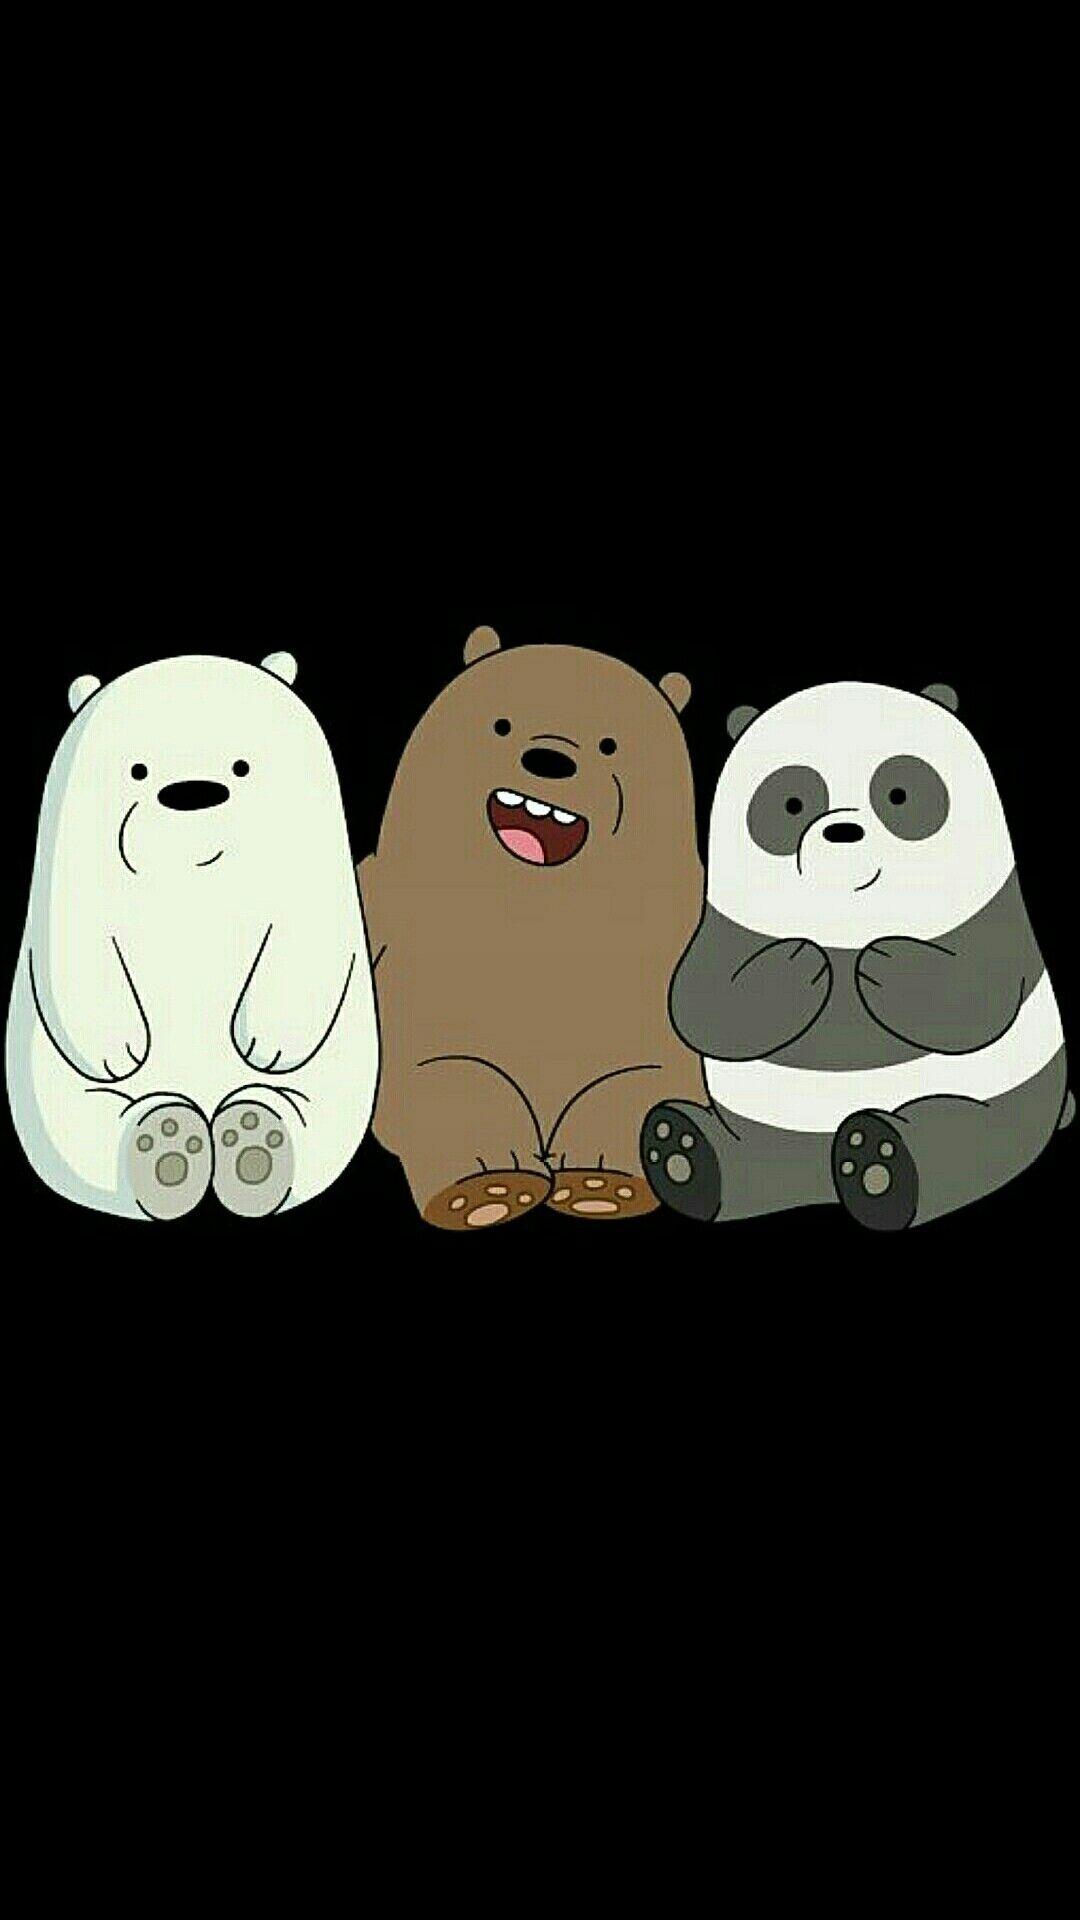 We Bare Bears e v e r y t h i n g Pinterest Bare